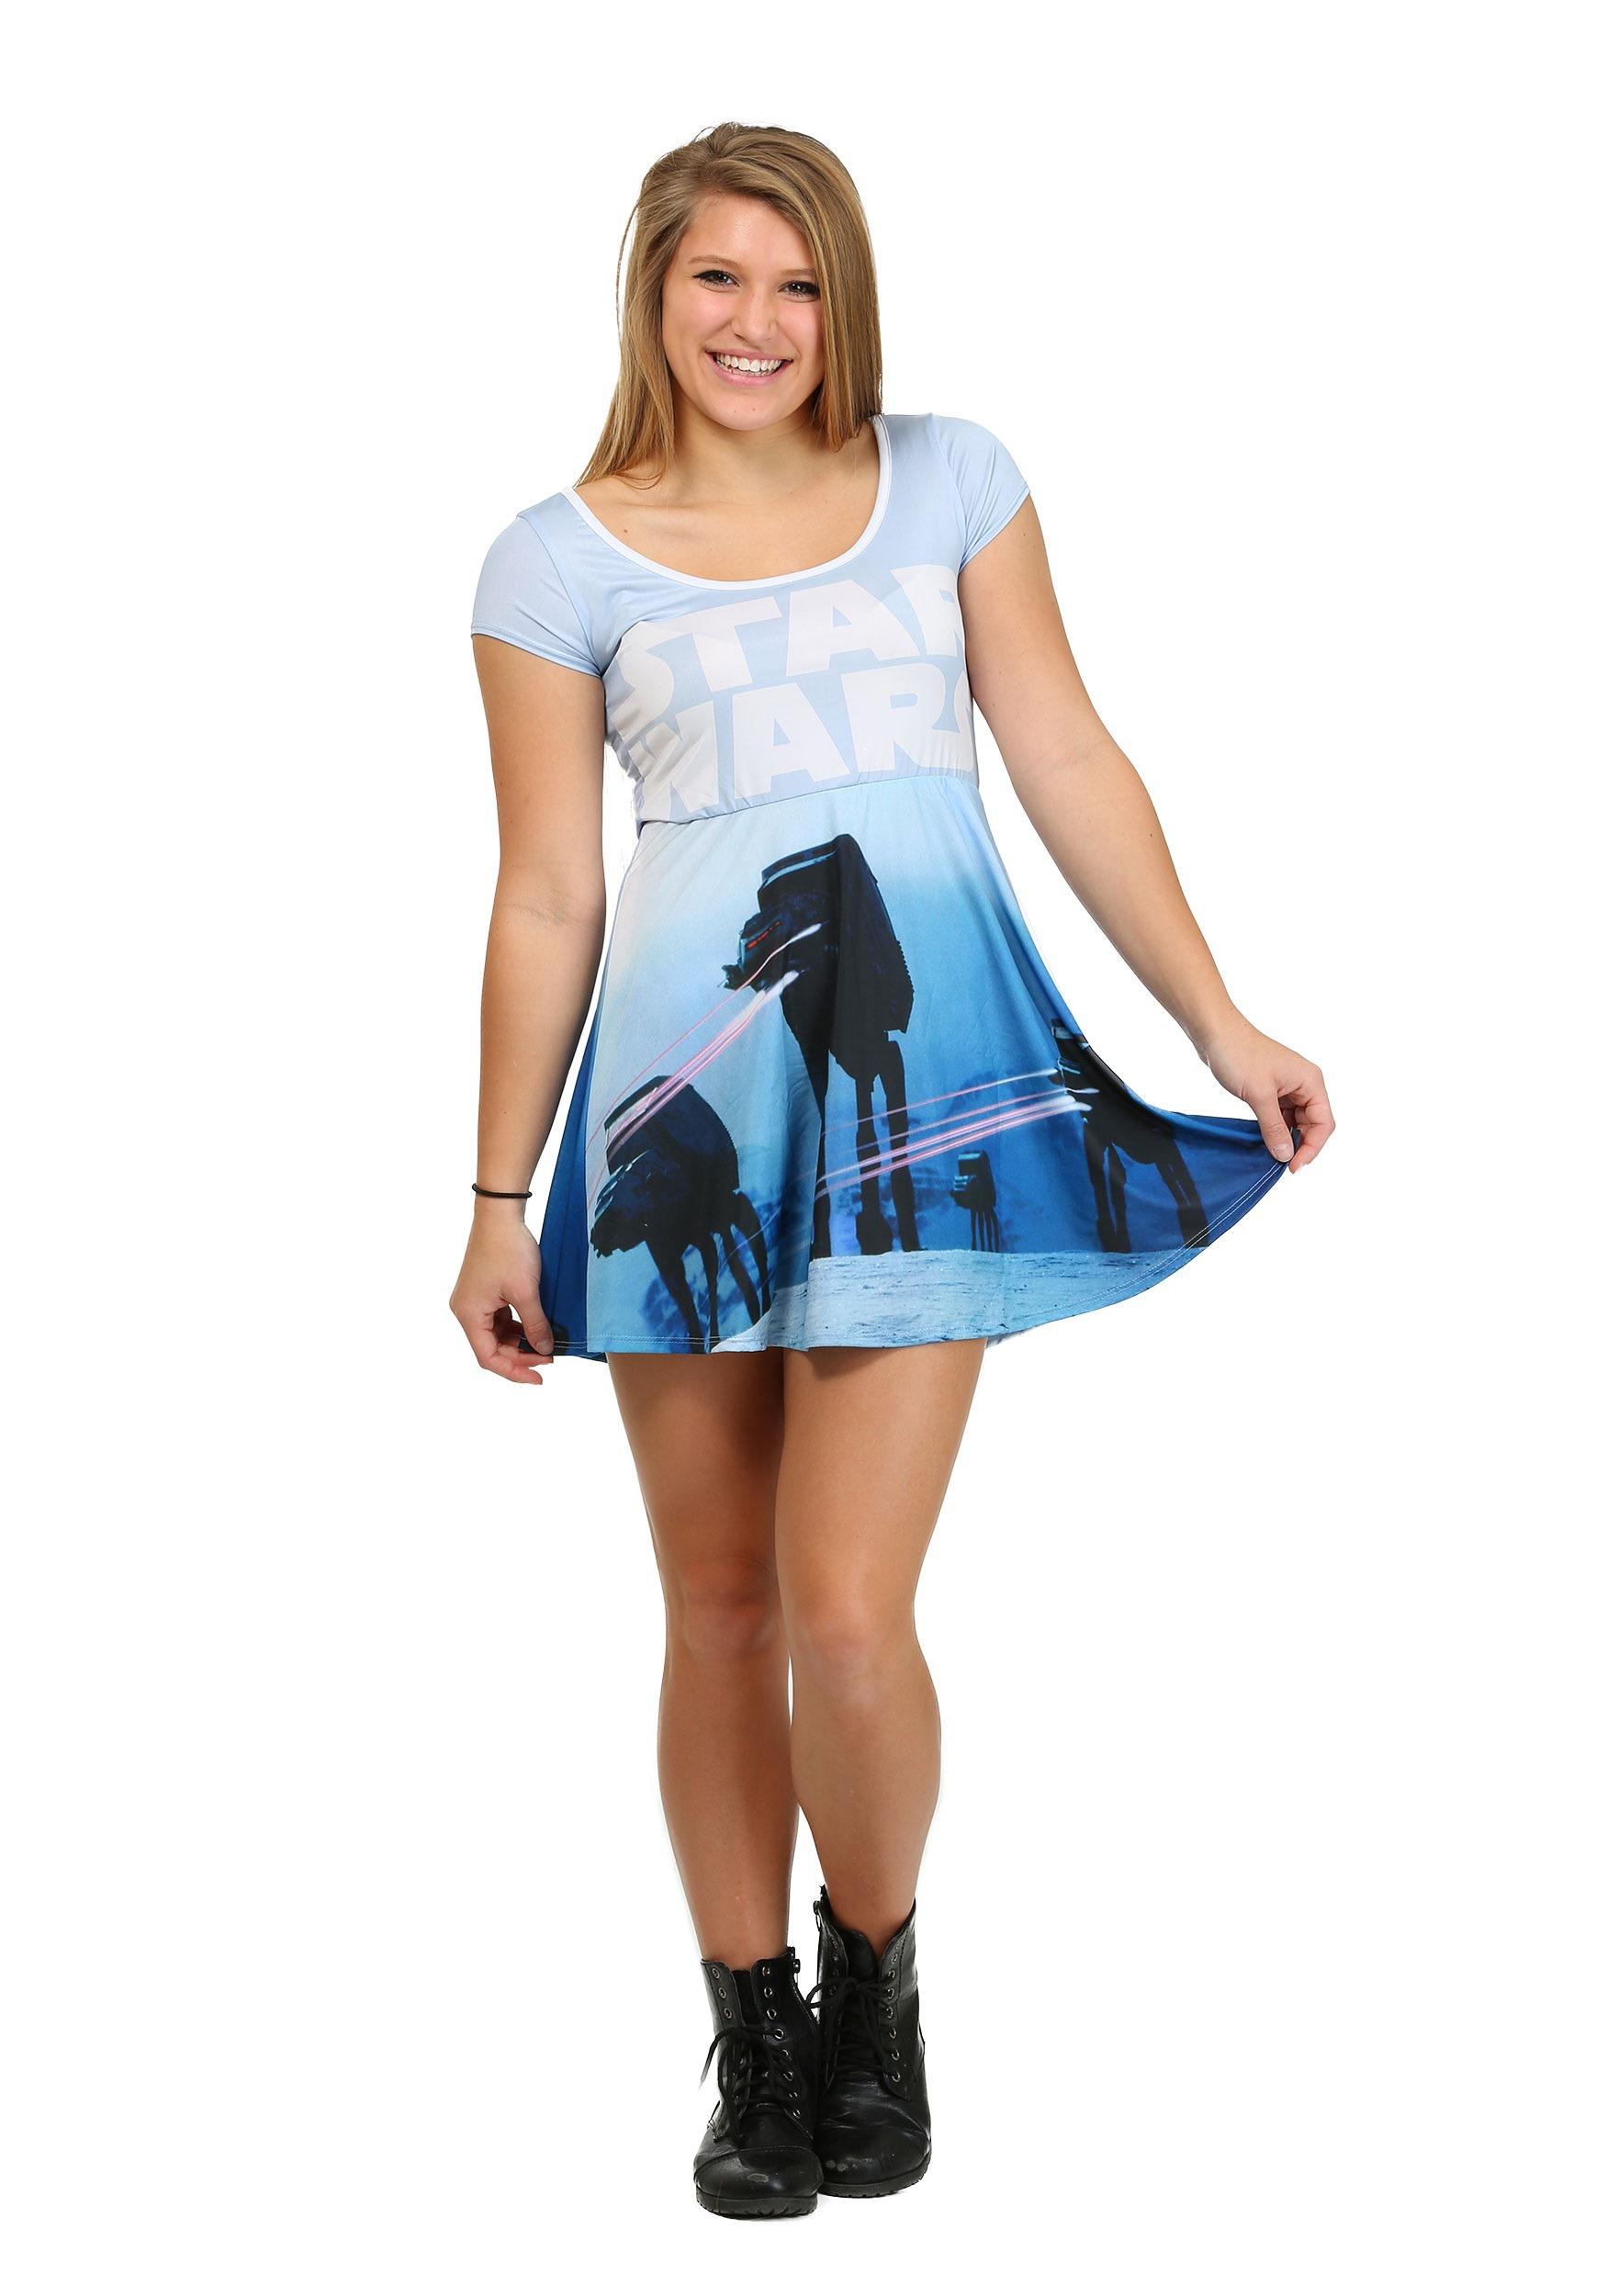 746fd27c61316 Casual Dress For Juniors